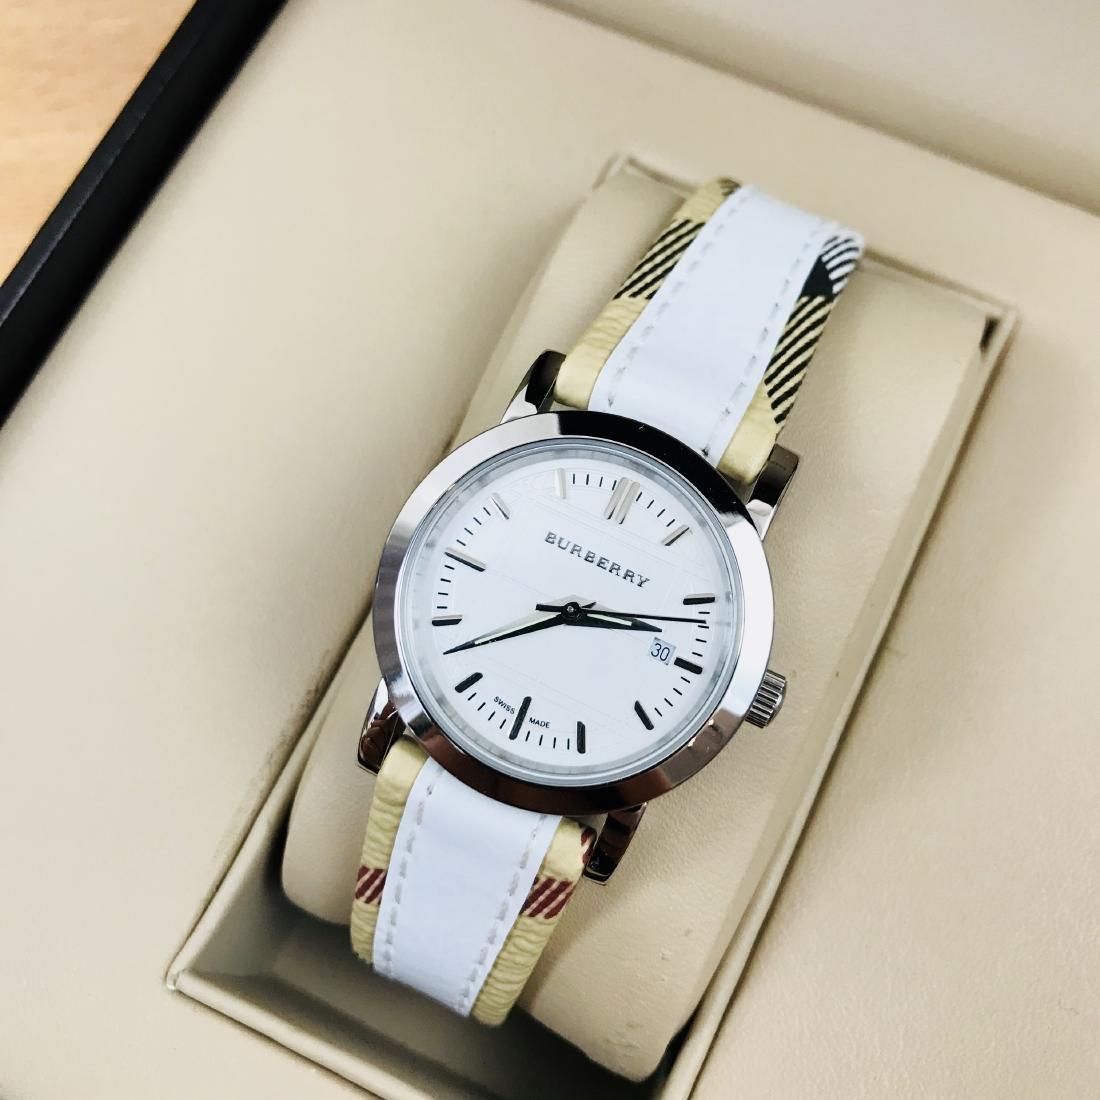 Burberry Swiss Made Classic Ladies Watch